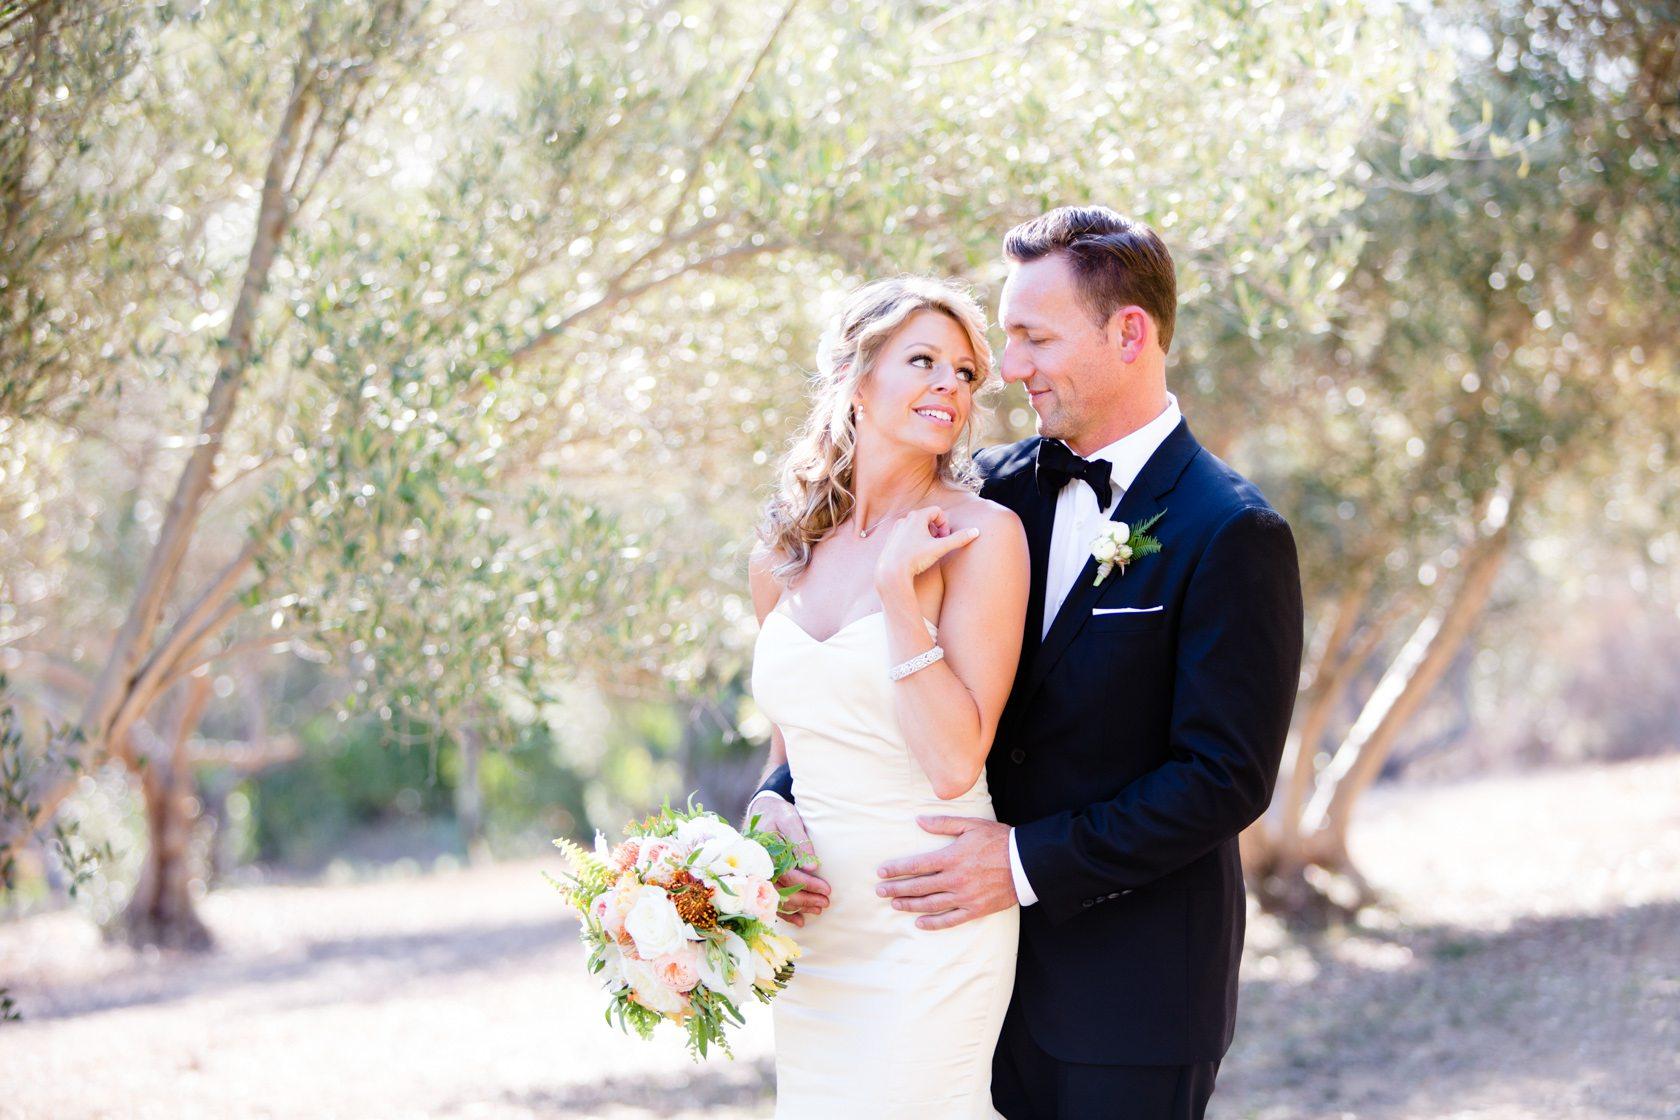 Rancho_Valencia_Resort_Wedding_035.jpg